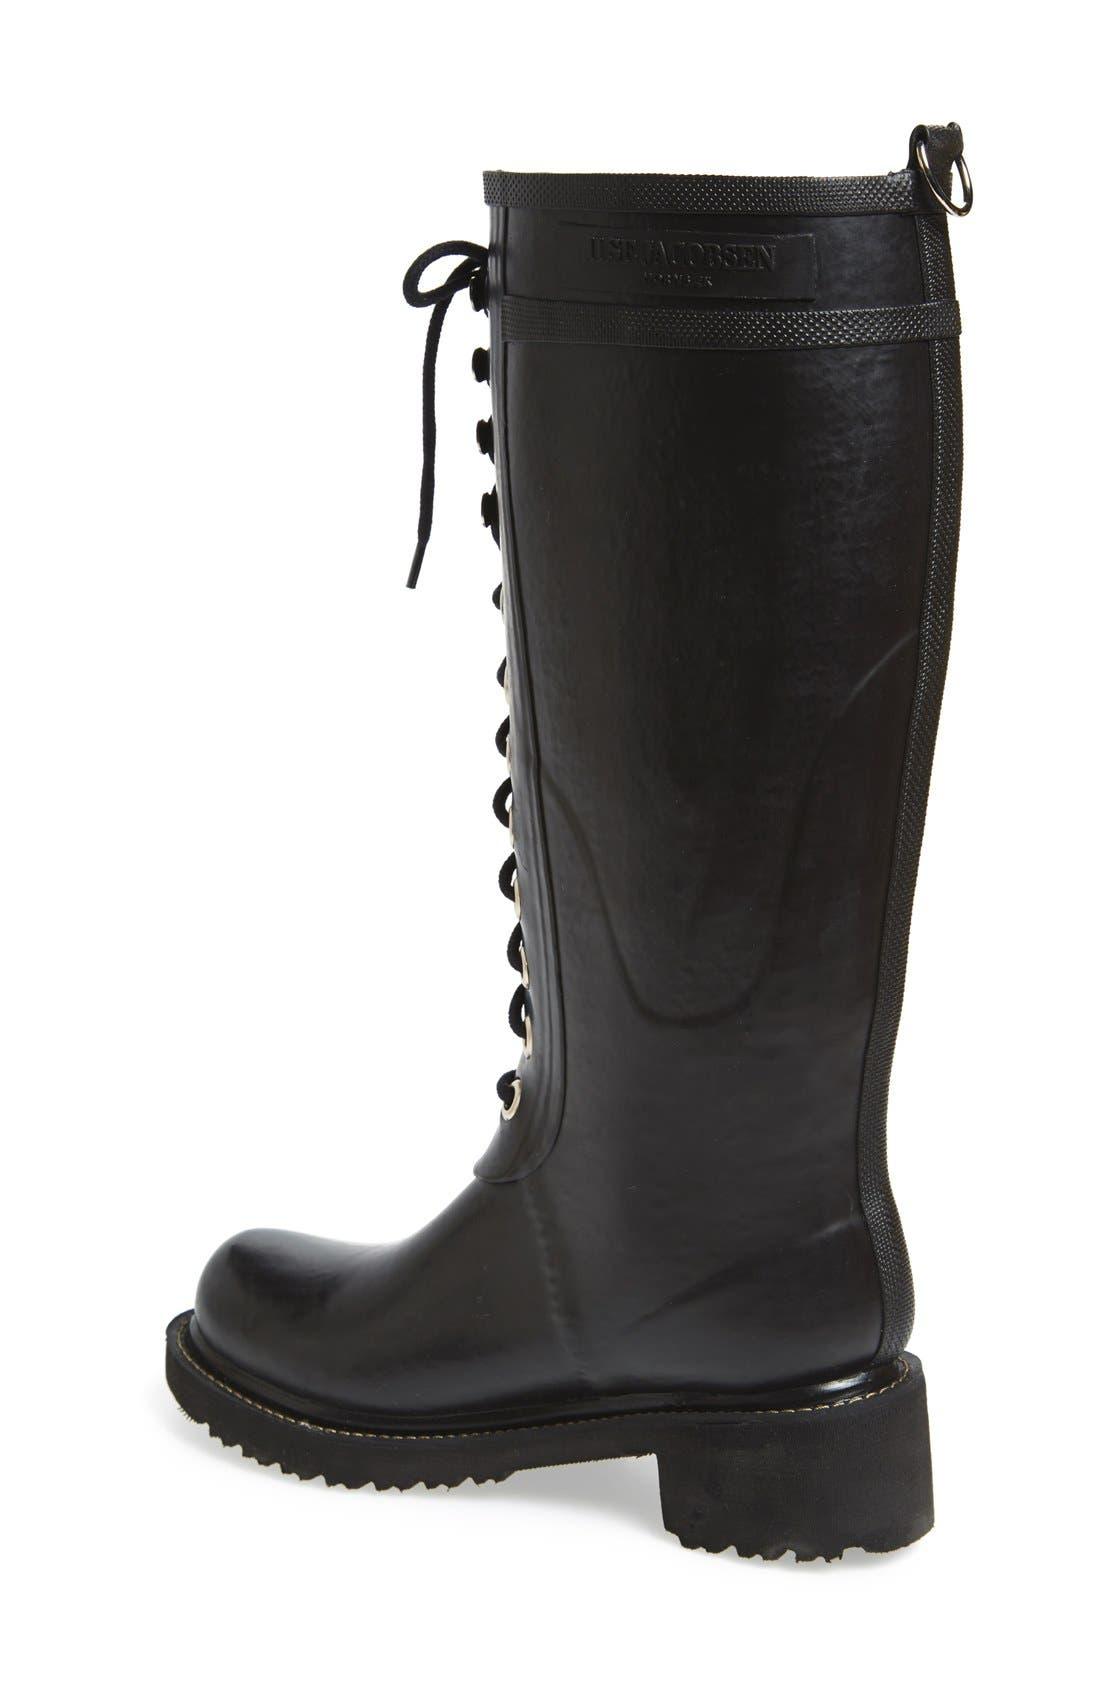 Waterproof Lace-Up Snow/Rain Boot,                             Alternate thumbnail 2, color,                             001